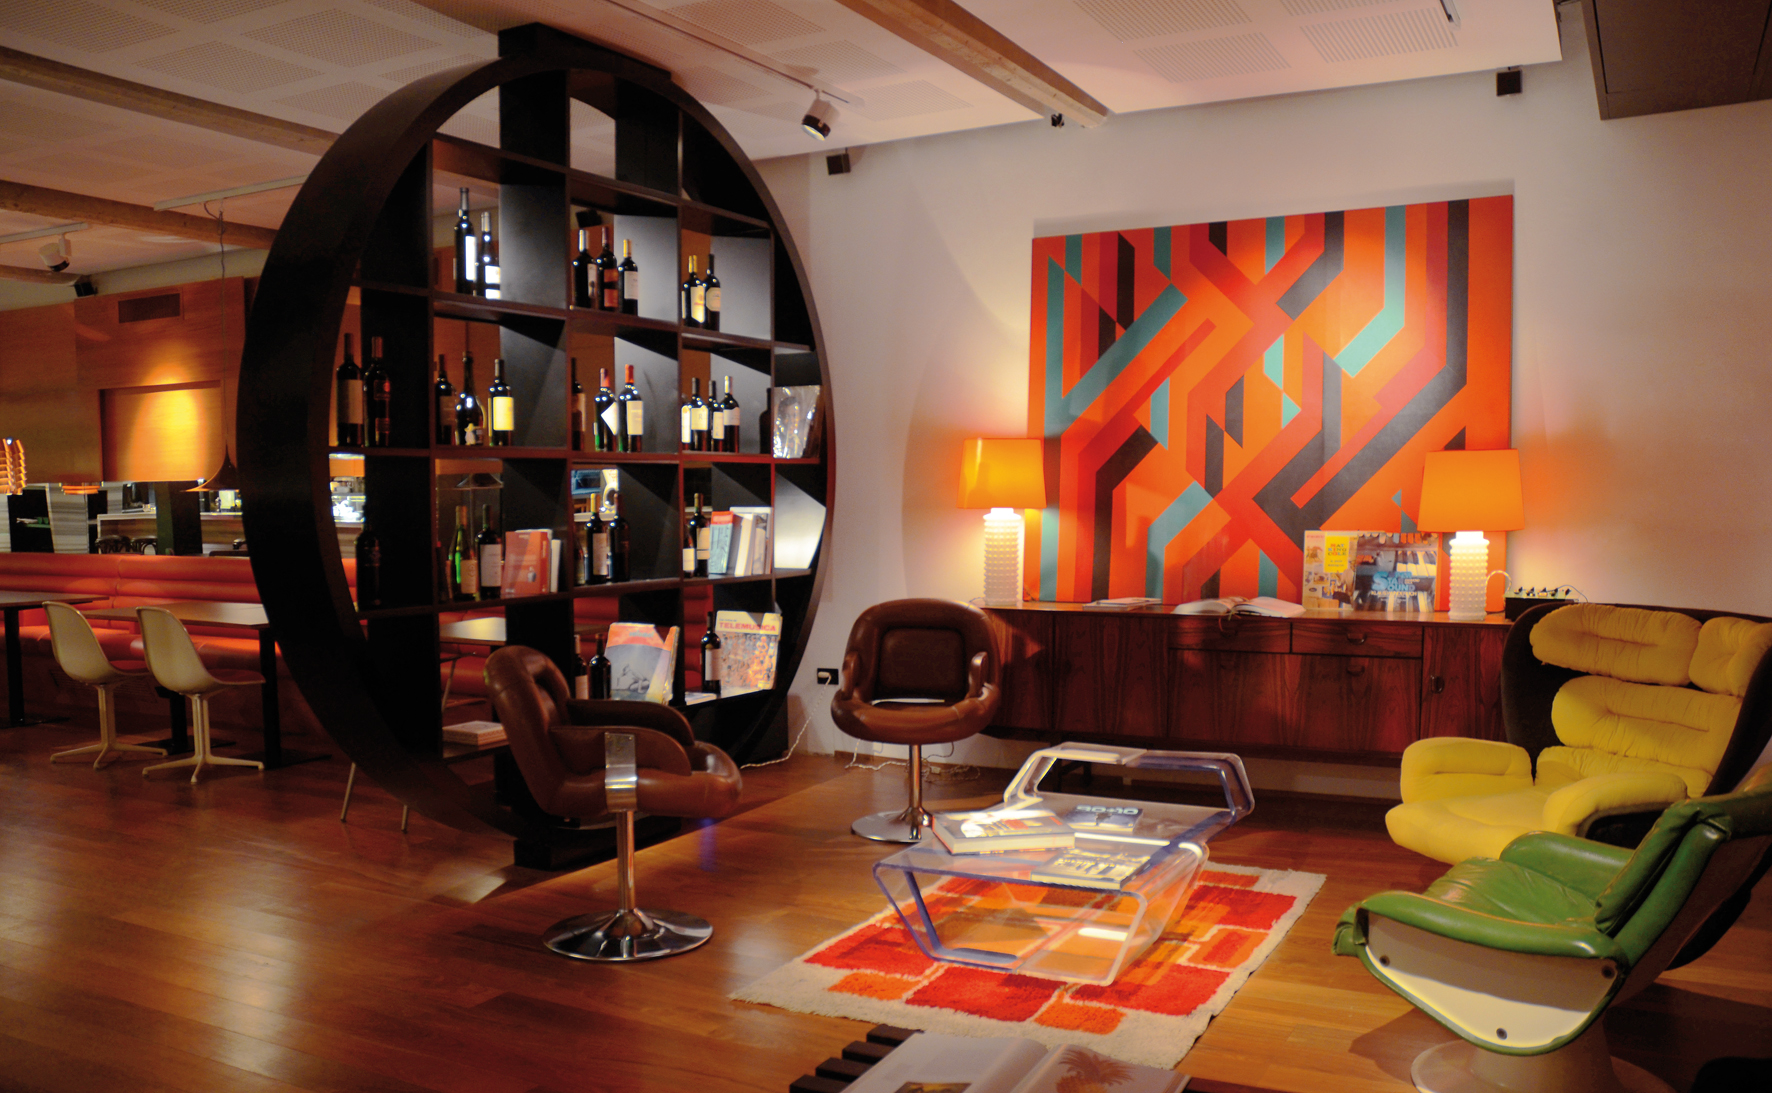 Retro Interior Design The Nostalgic Style